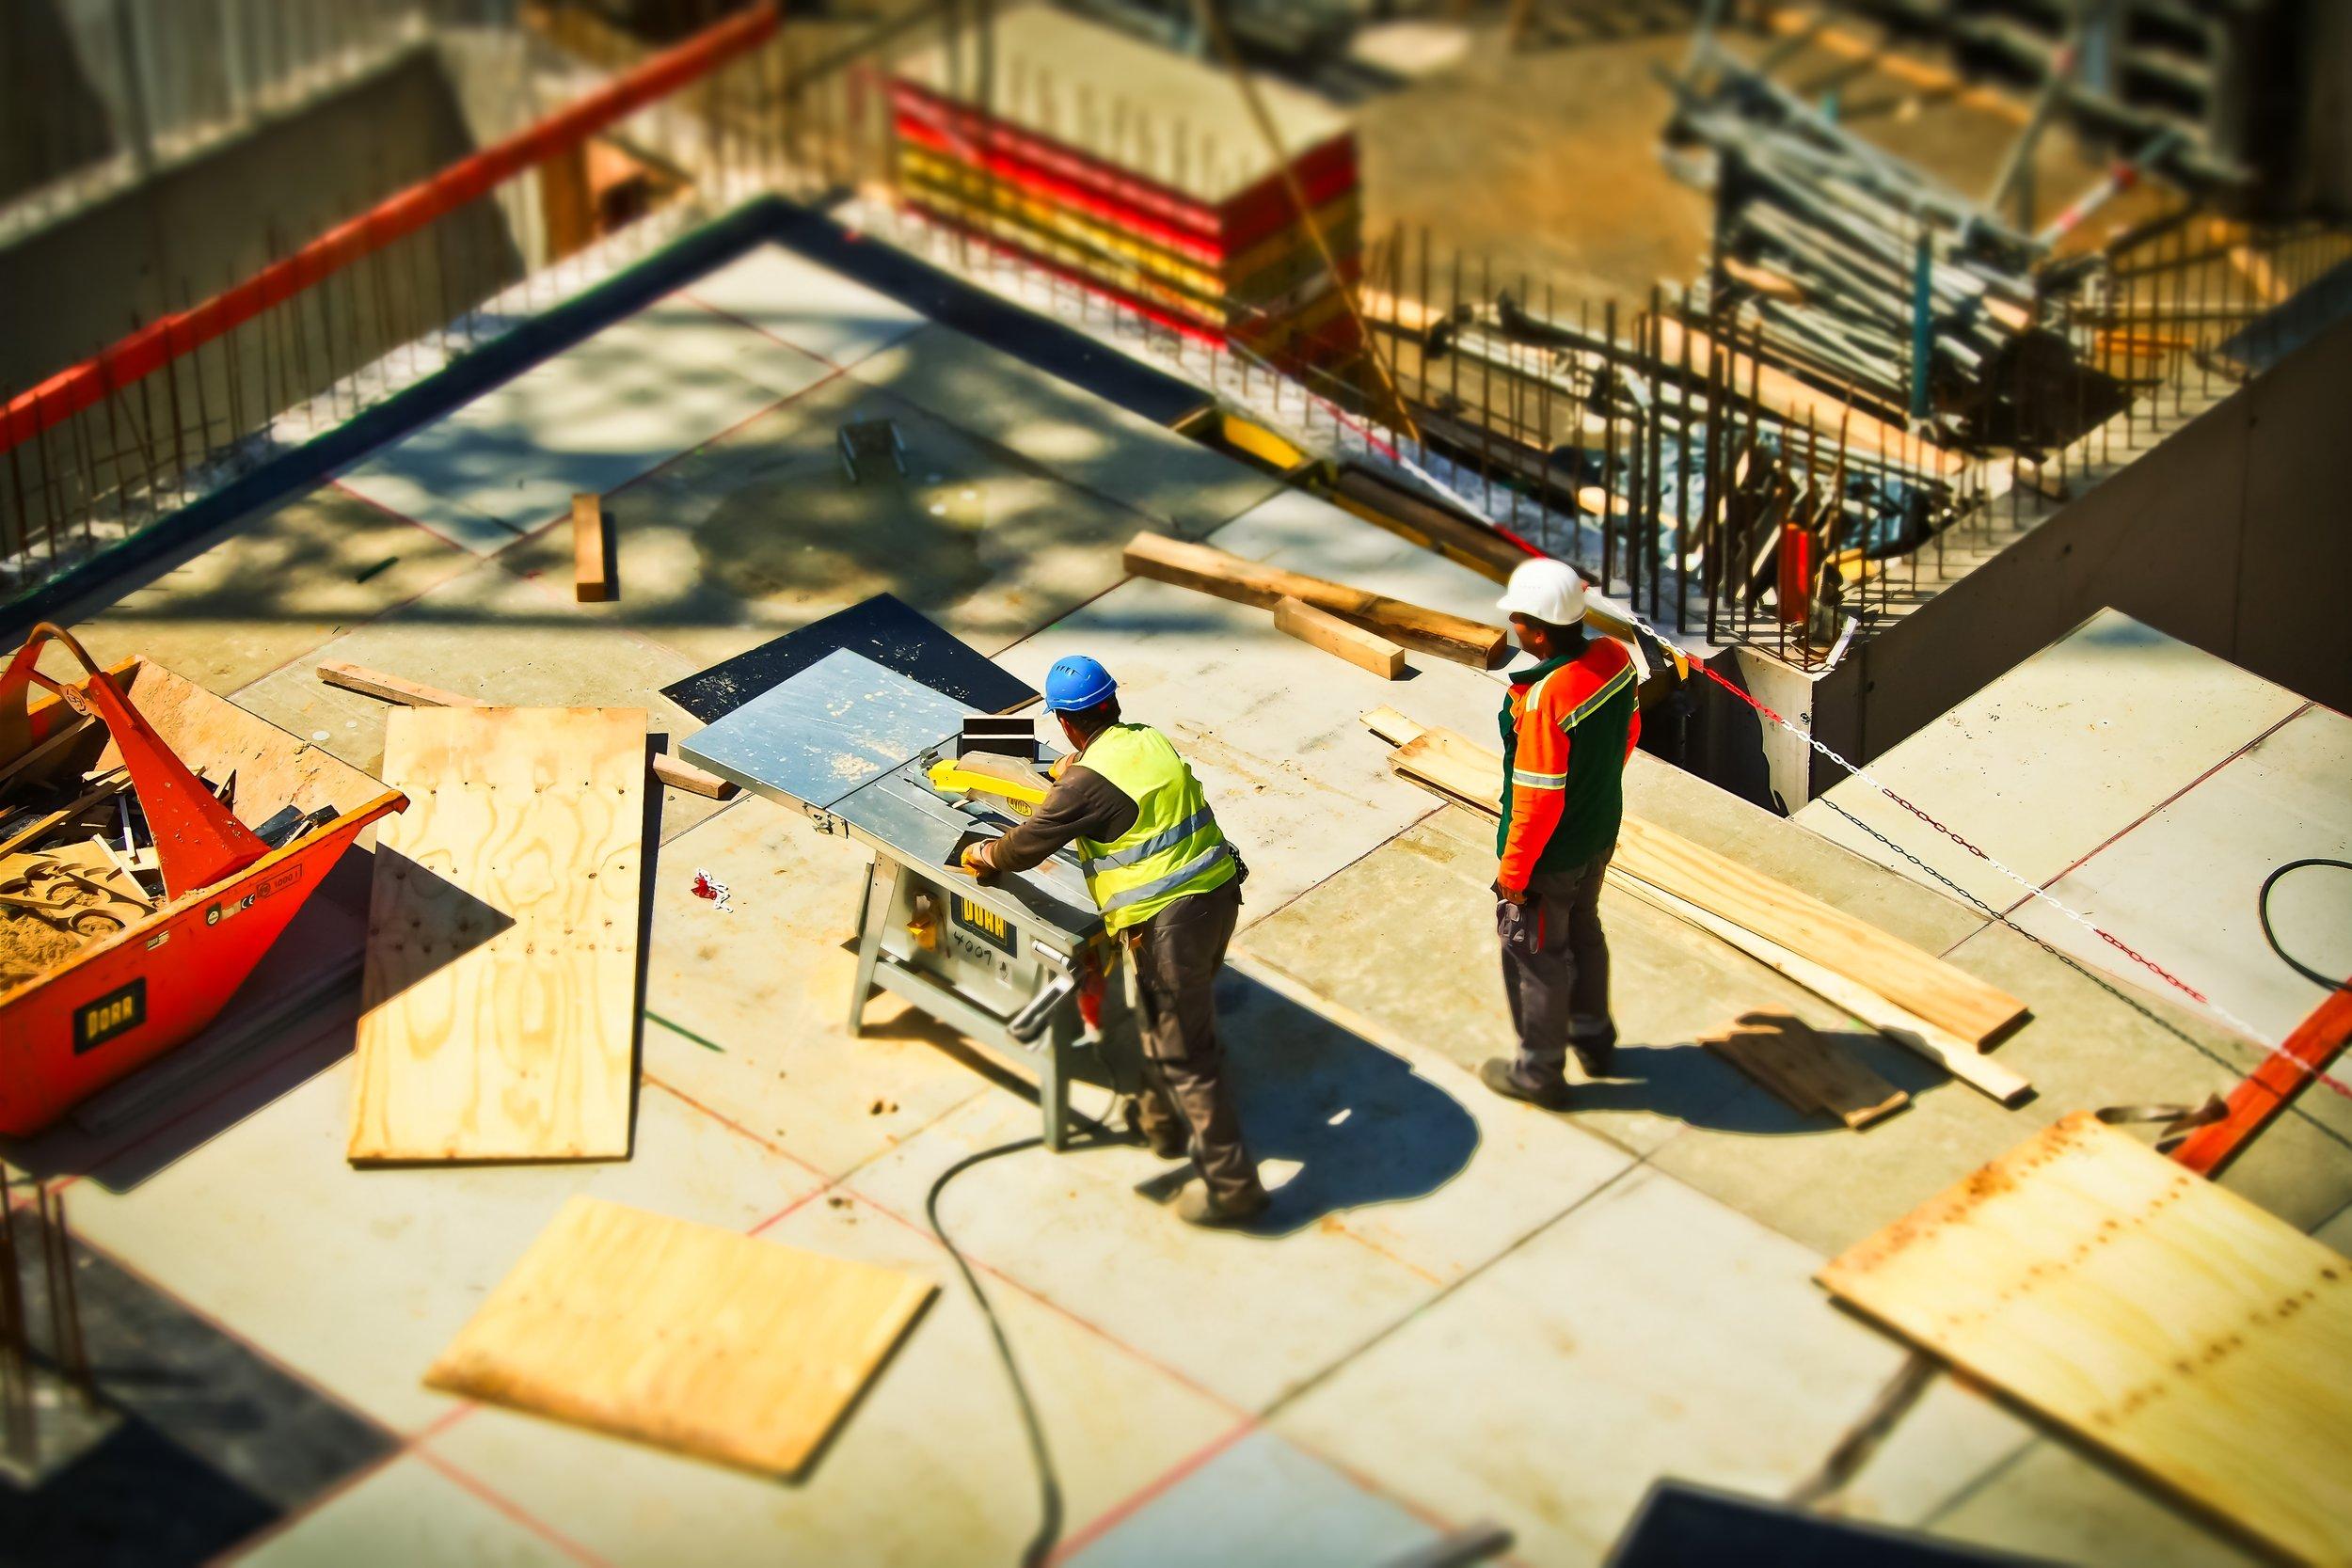 construction-site-build-construction-work-159306.jpeg.jpg